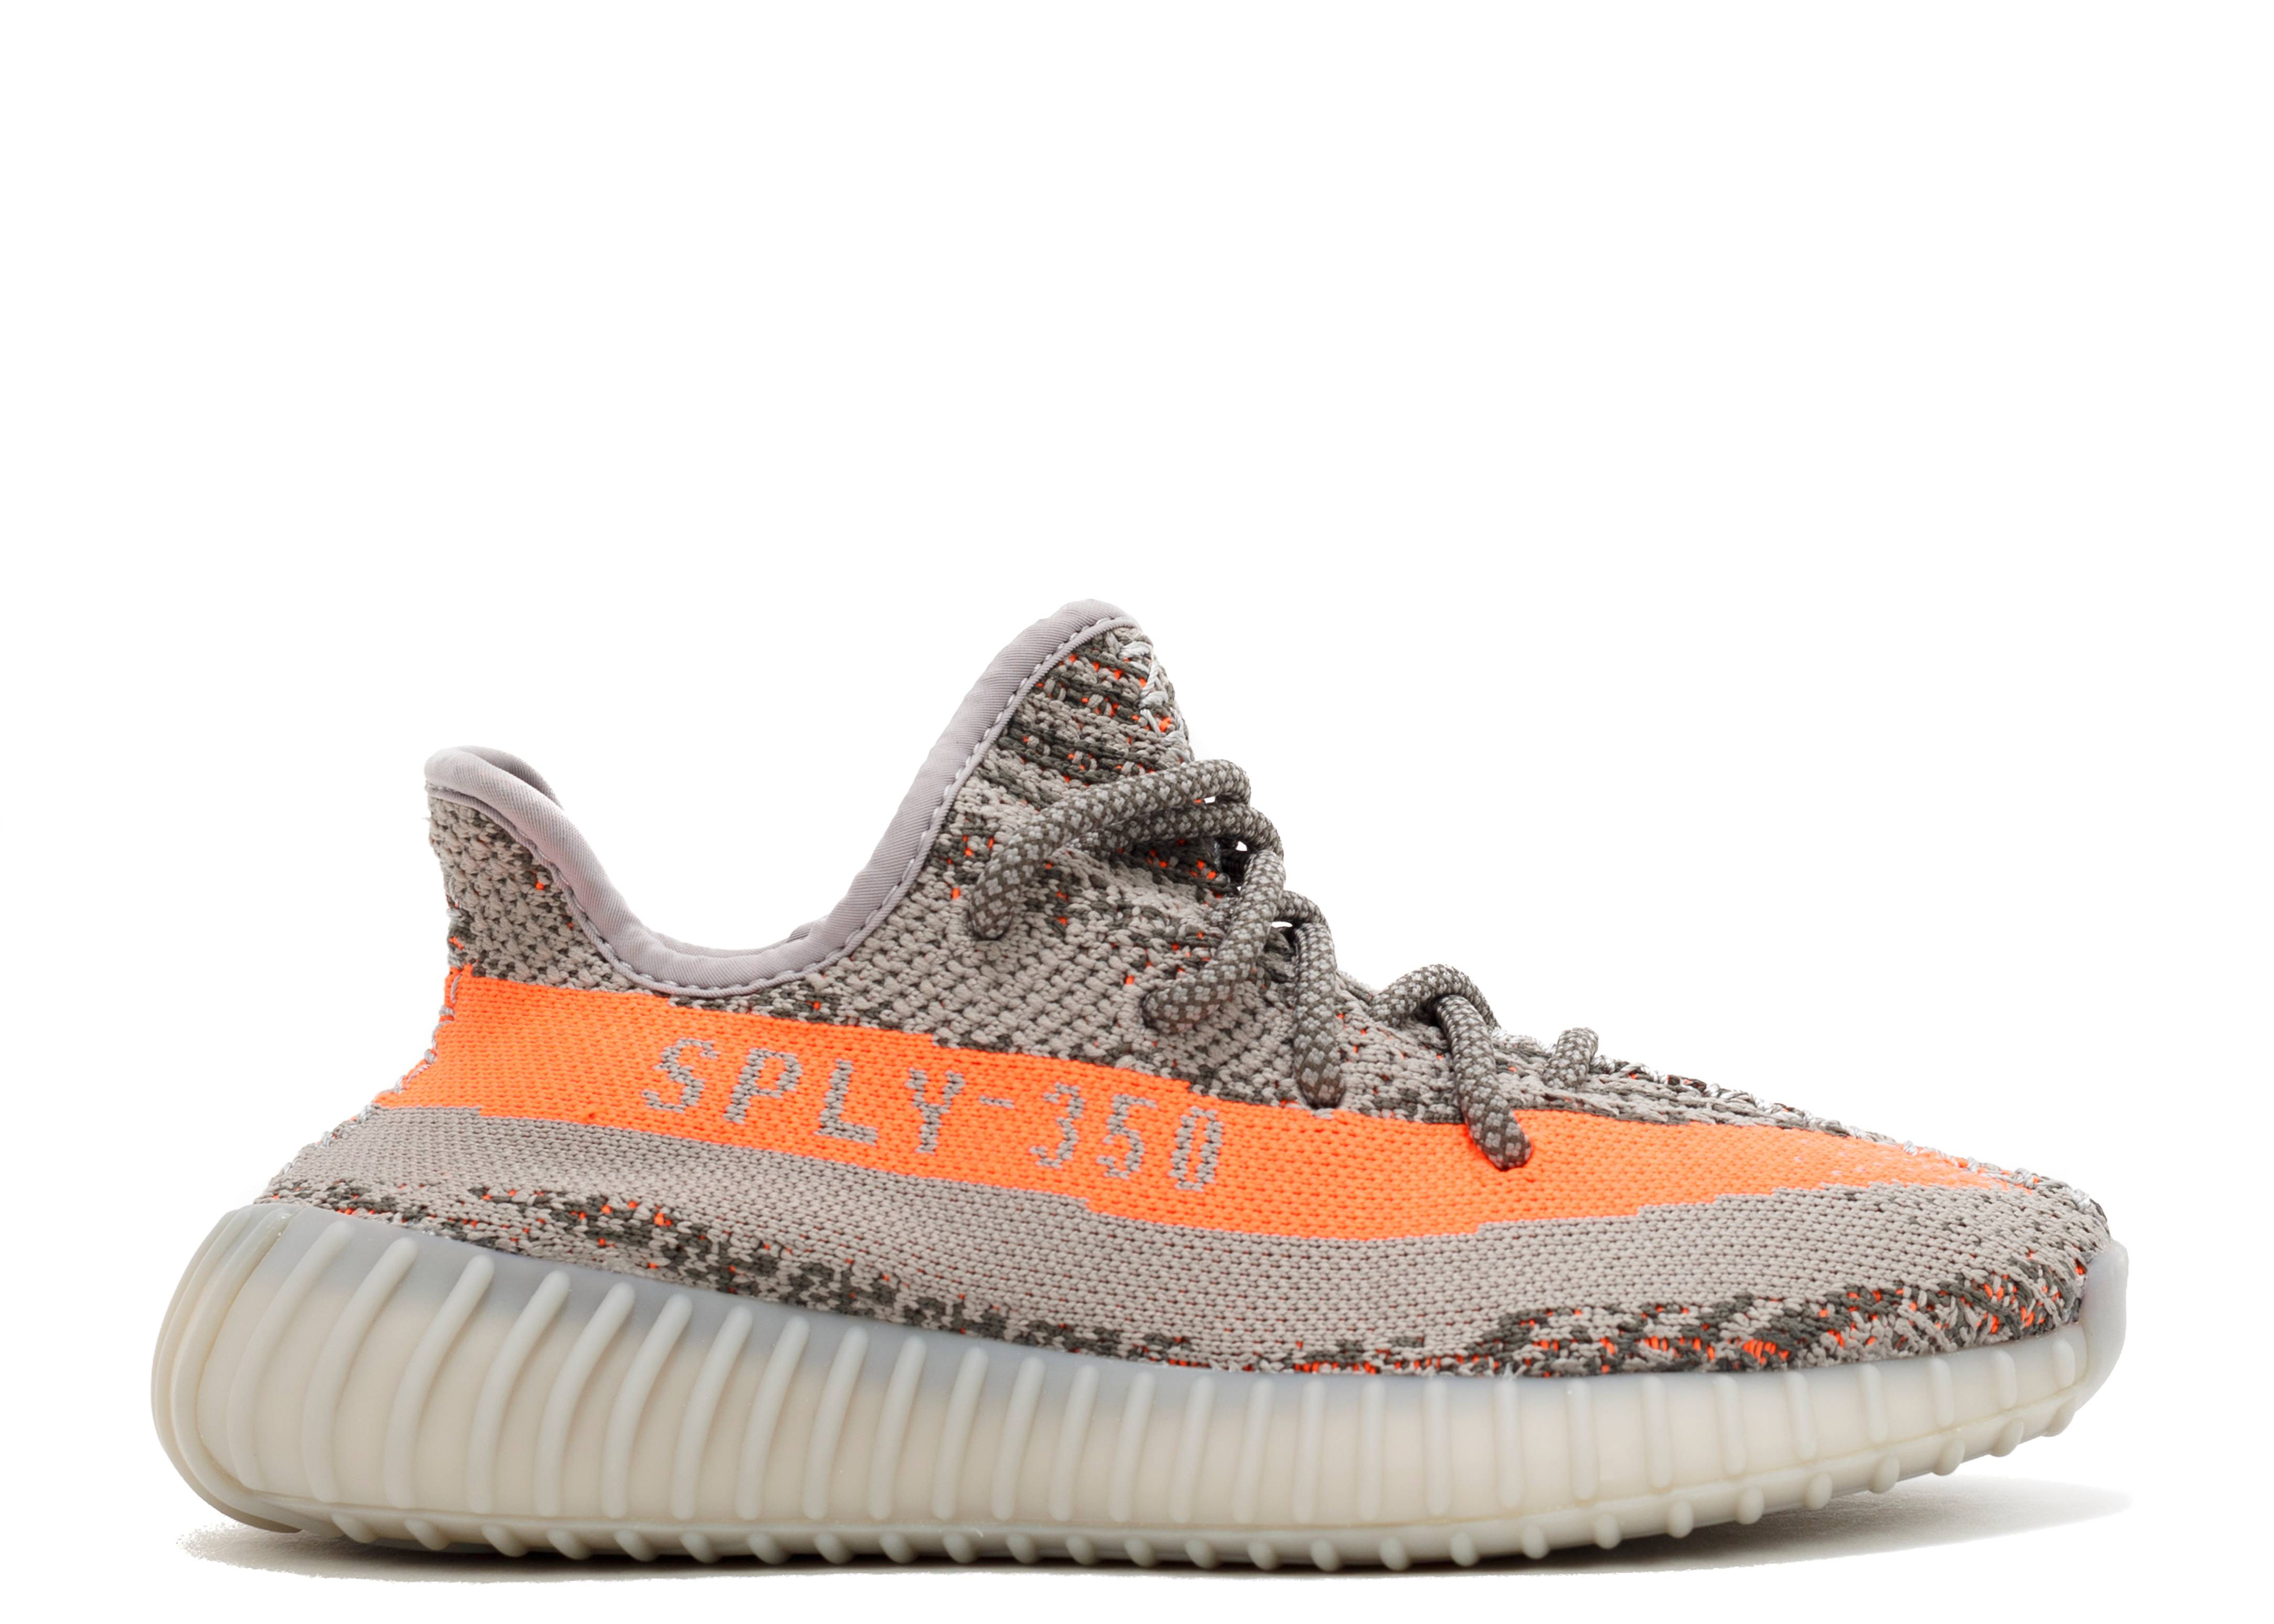 adidas yeezy boost 350 orange